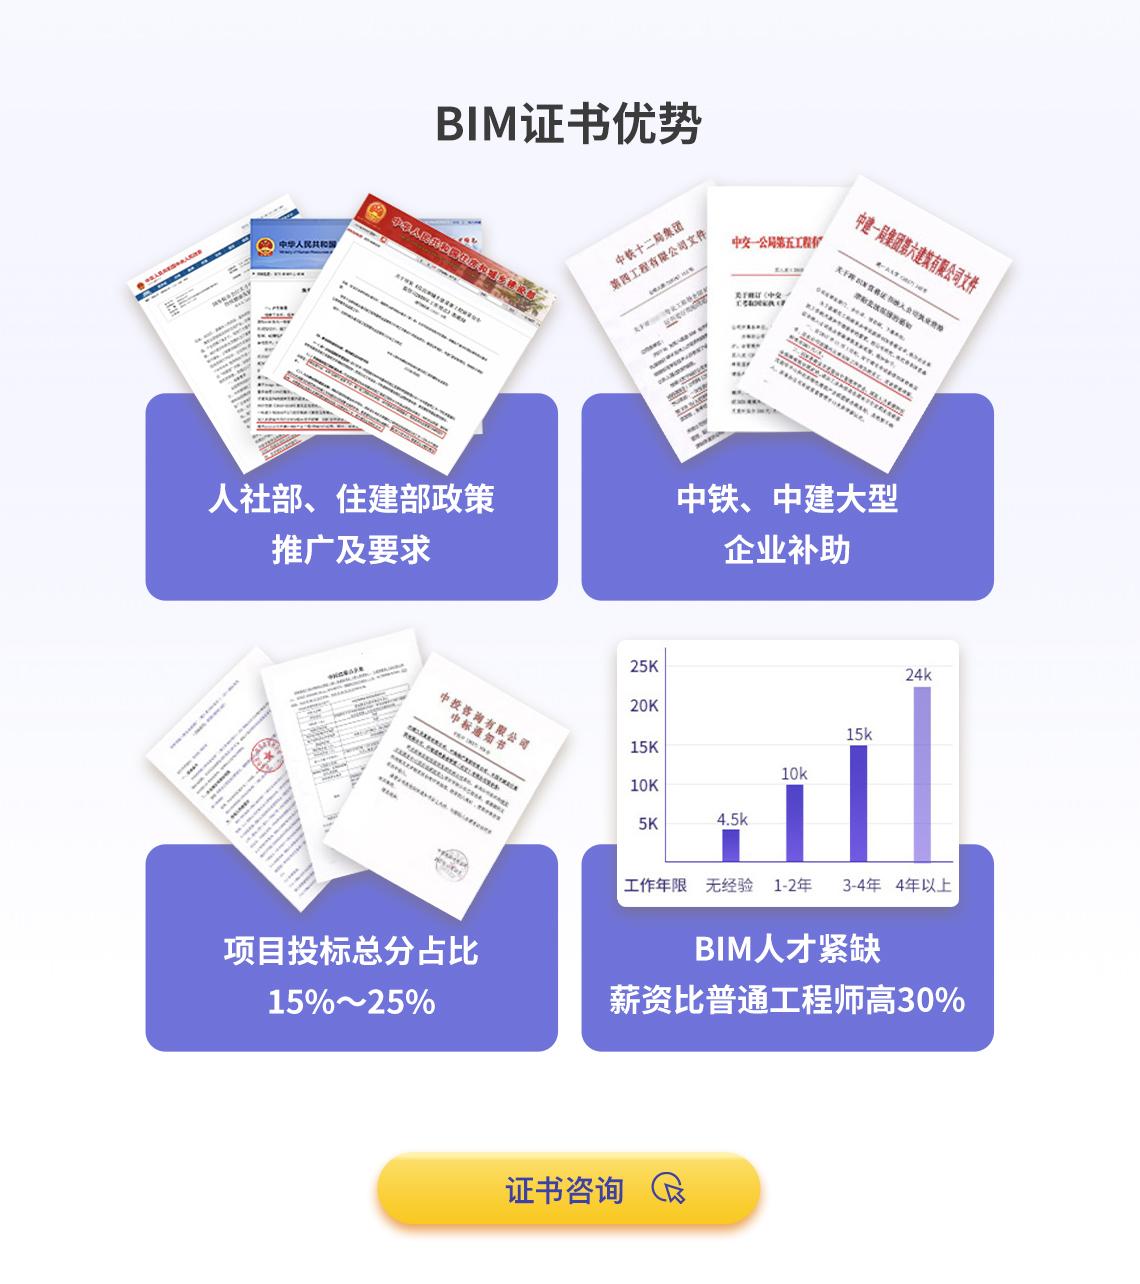 BIM证书优势:人社部\住建部政策推广及要求中,铁中建大型企业补助,项目投标总占比15%至25%,人才紧缺,薪资比普通工程师高